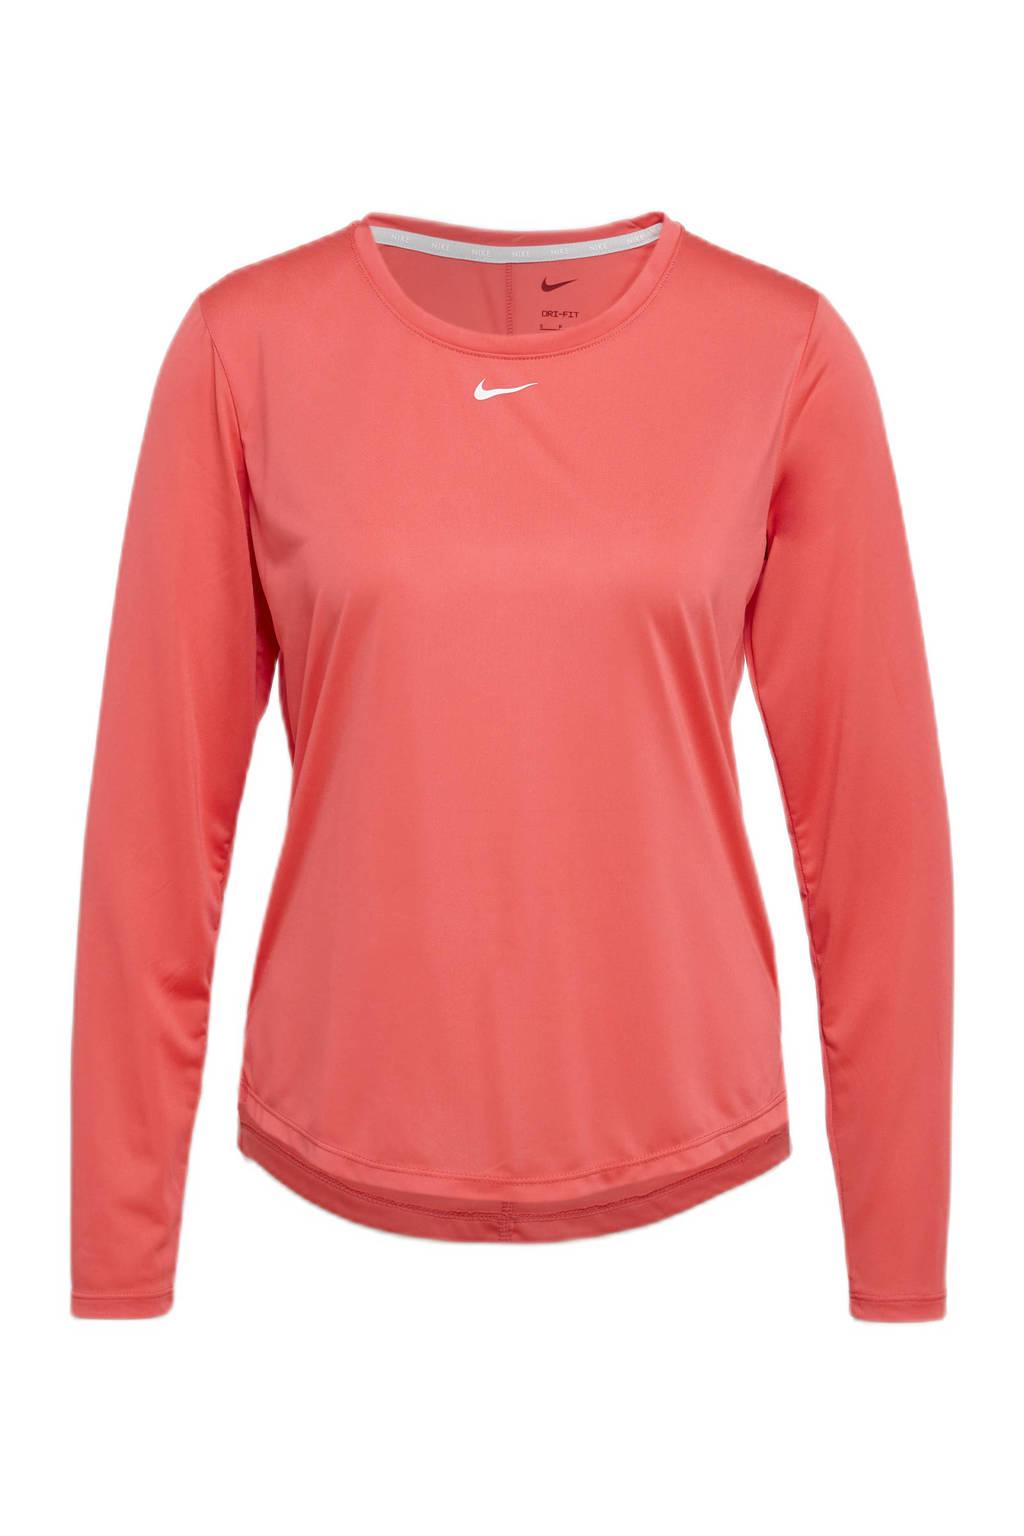 Nike sport T-shirt lichtrood, Lichtrood